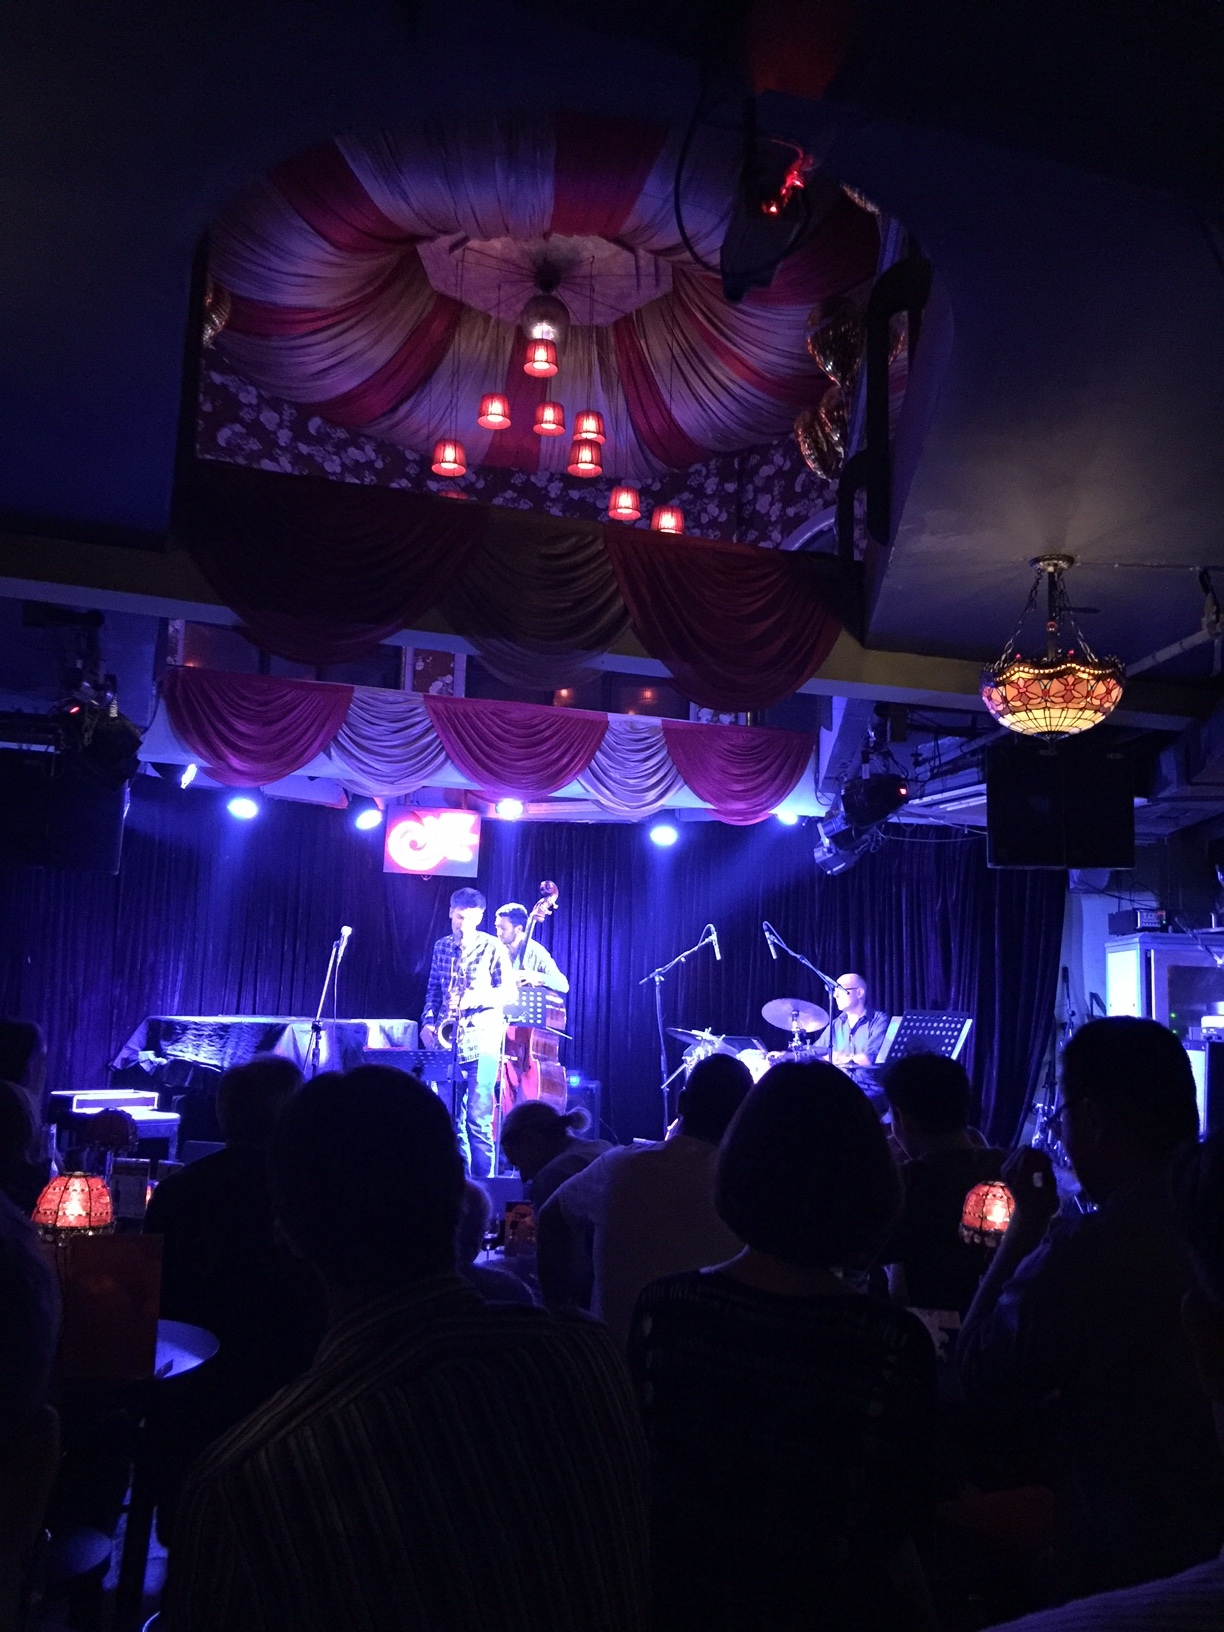 Partikel on stage at JZ Club Shanghai